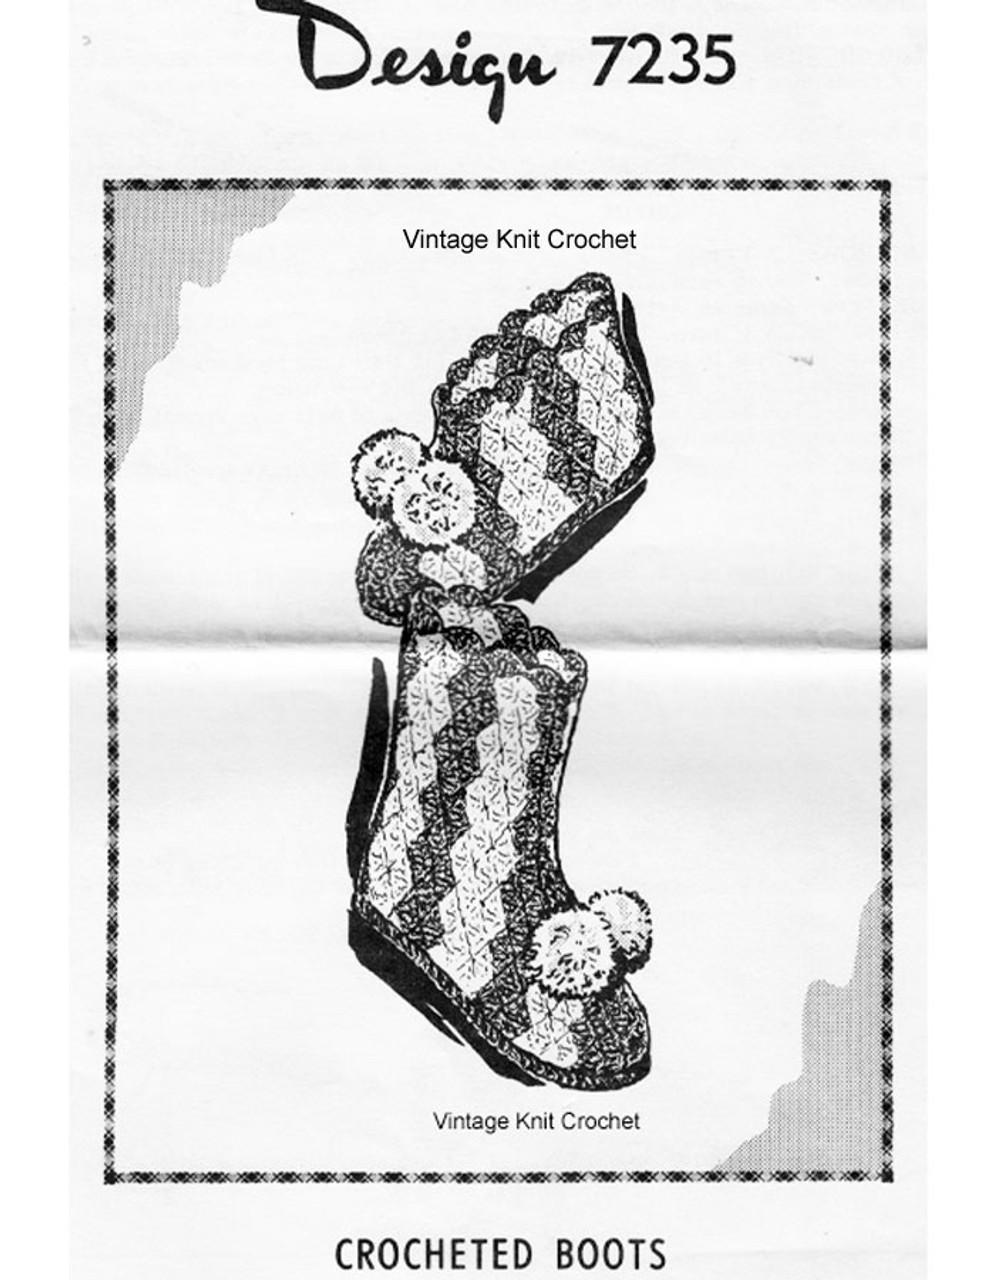 Crochet Shell Stitch Boots Pattern, Design 7235